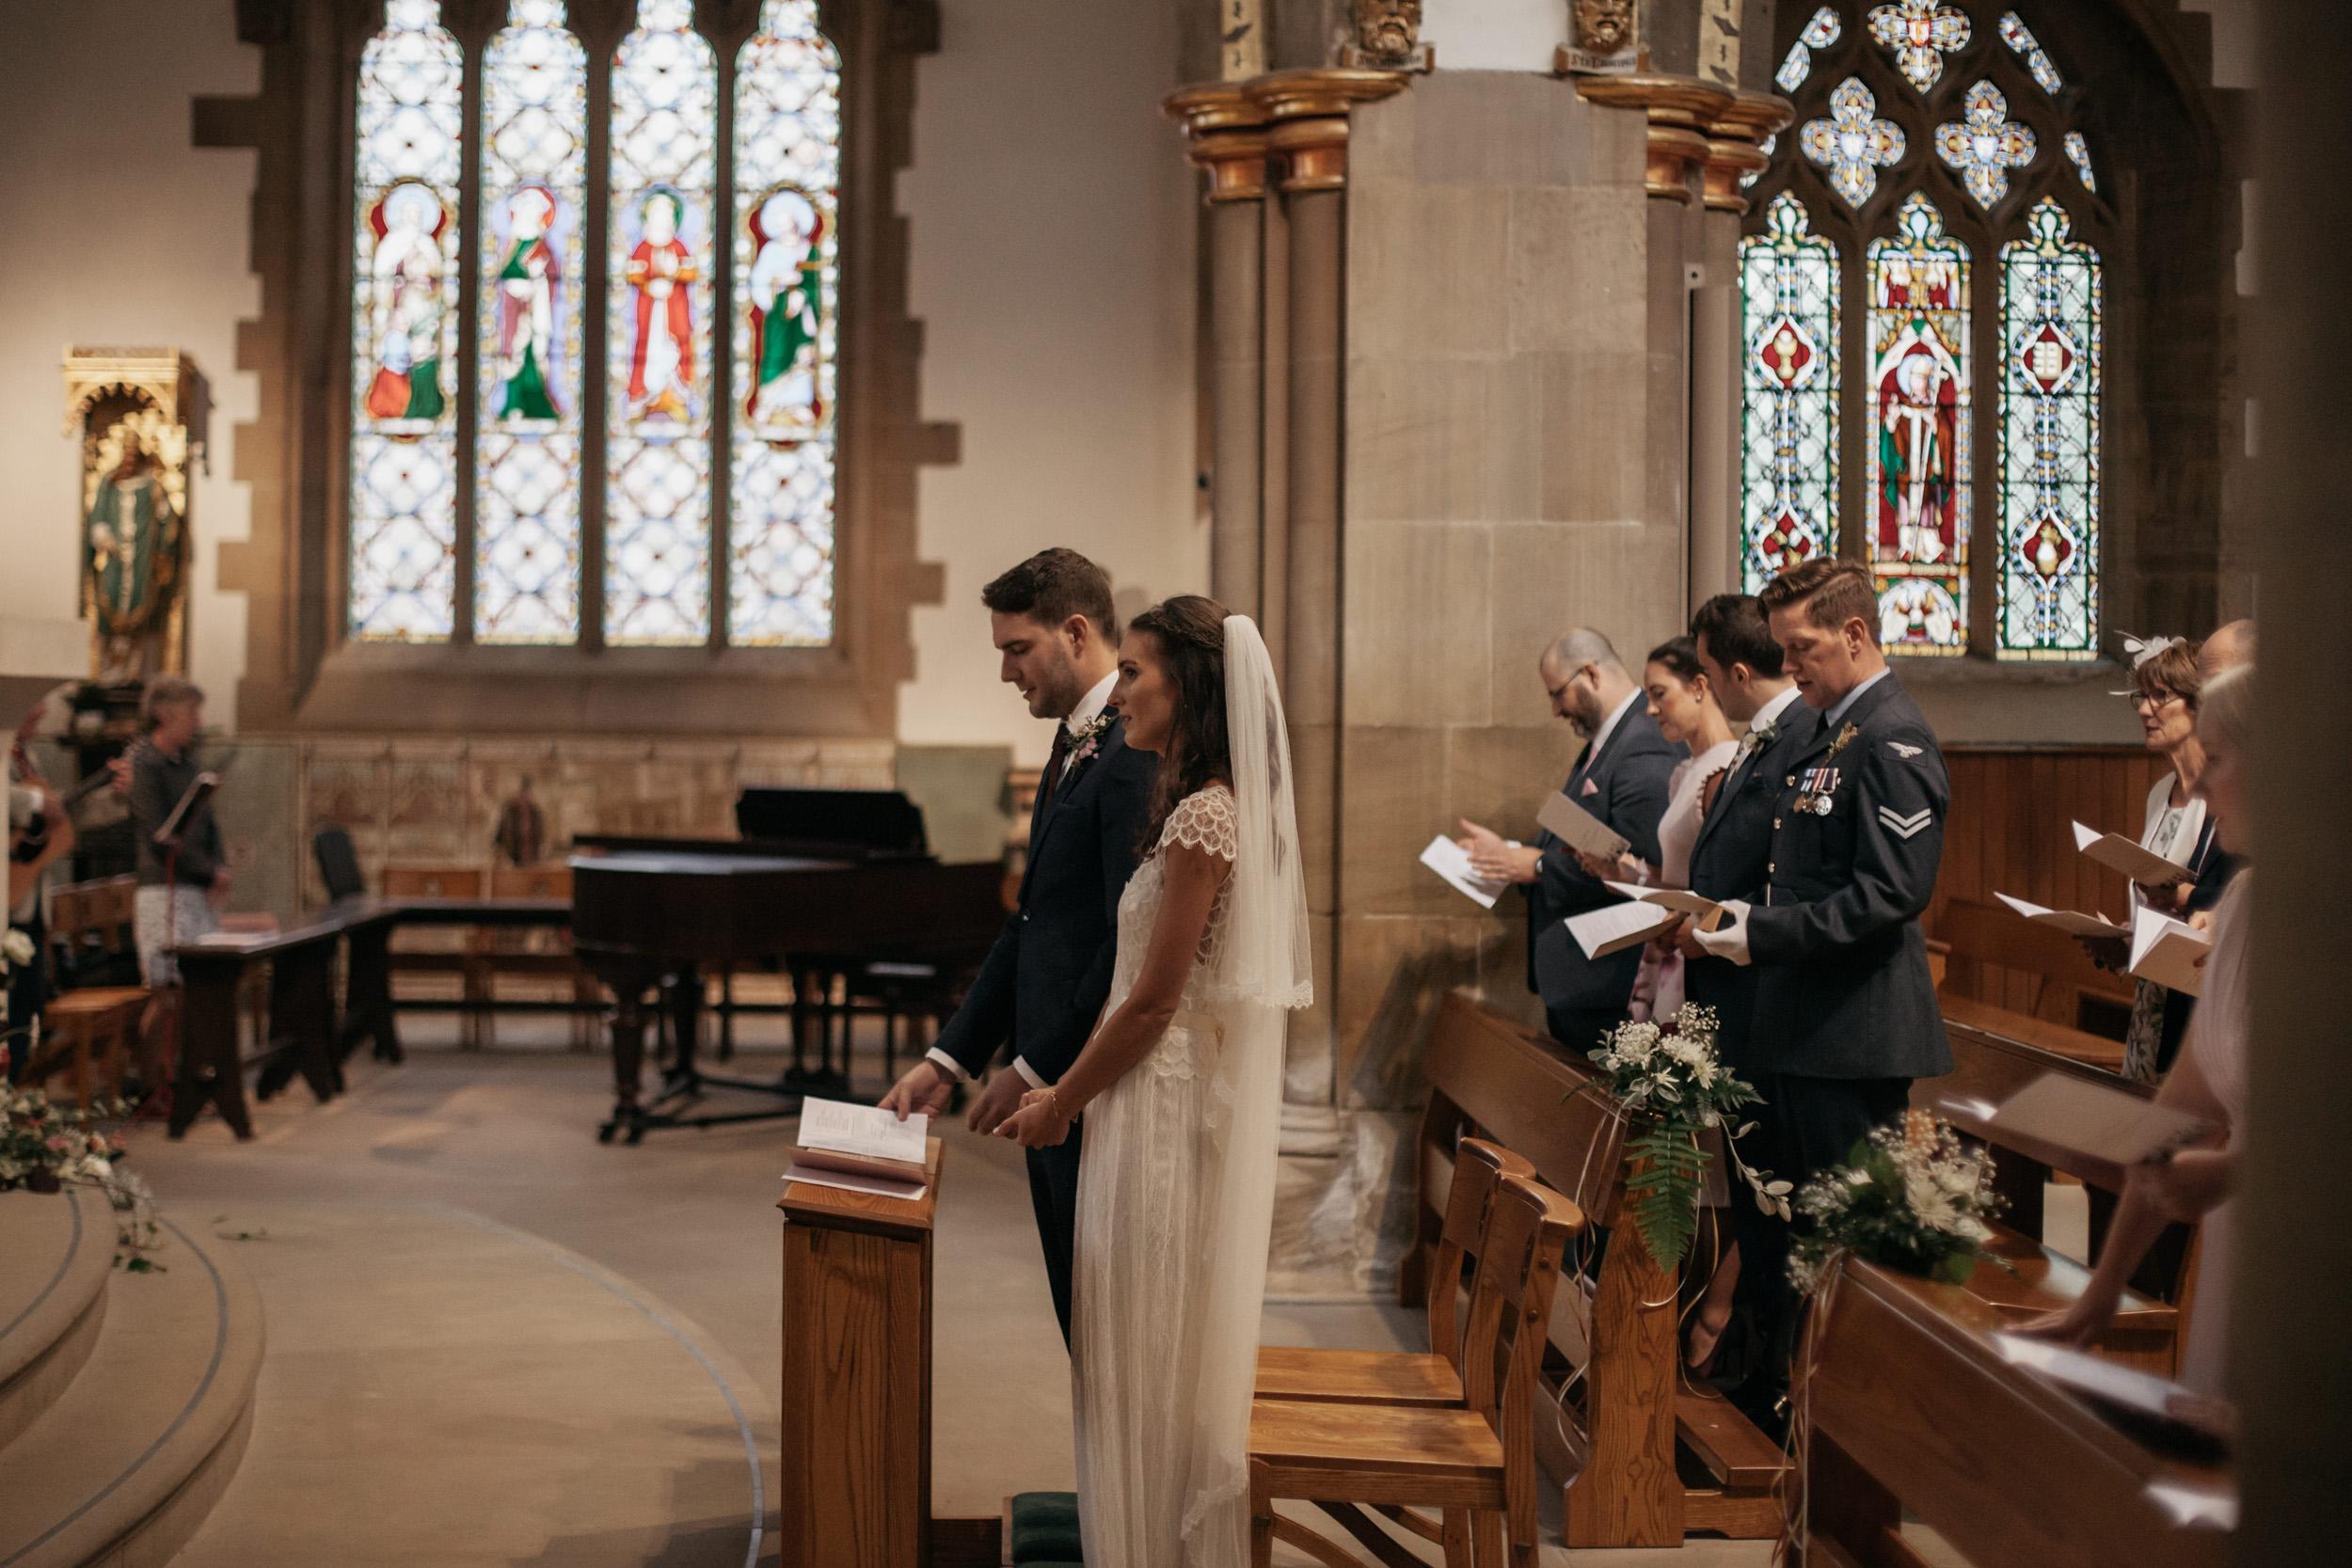 Joasia-Kate-Beaumont-Bohemian-Lace-Wedding-Dress-Peak-District-Sheffield-Wedding-10.jpg